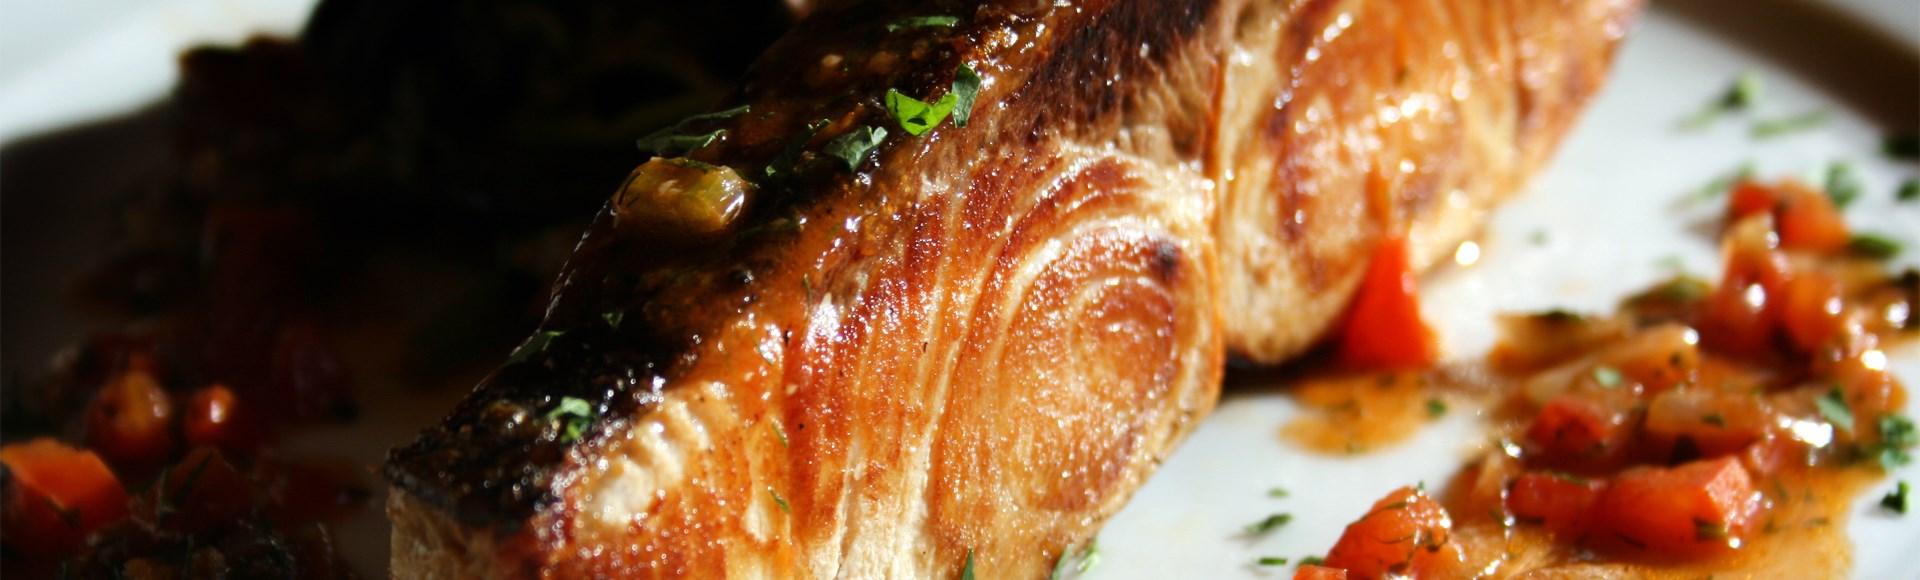 antonis-stavros-chania-crete-greece-29 - Chef Antonis & Stavros - Chania, Kreta, Hellas - Alargo | Håndplukkede ferieboliger på Kreta, Korfu og Paros